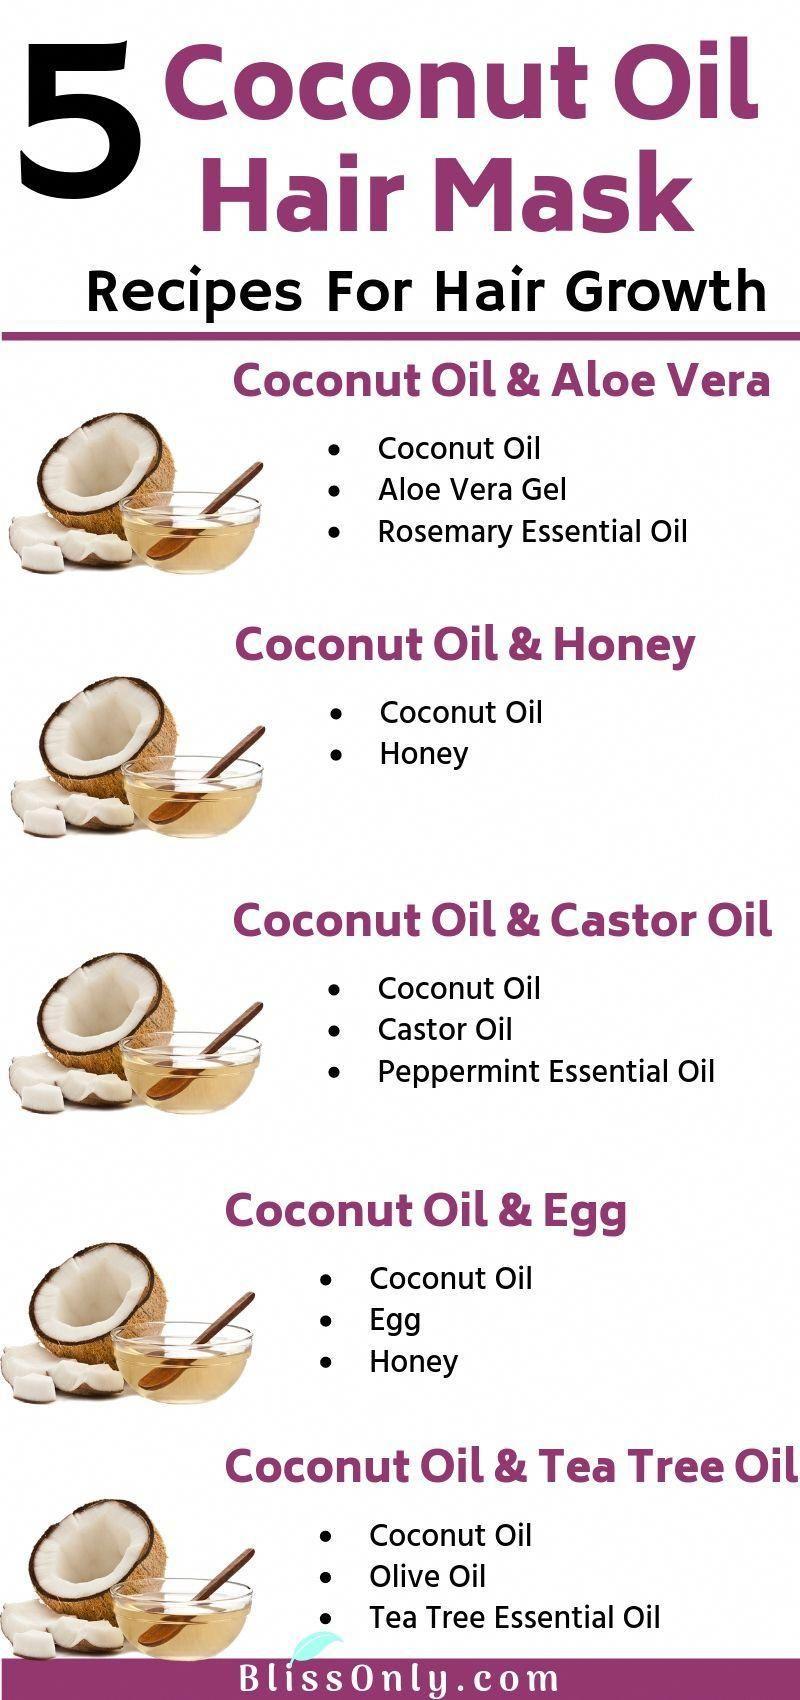 5 best coconut oil hair mask recipes for hair growth